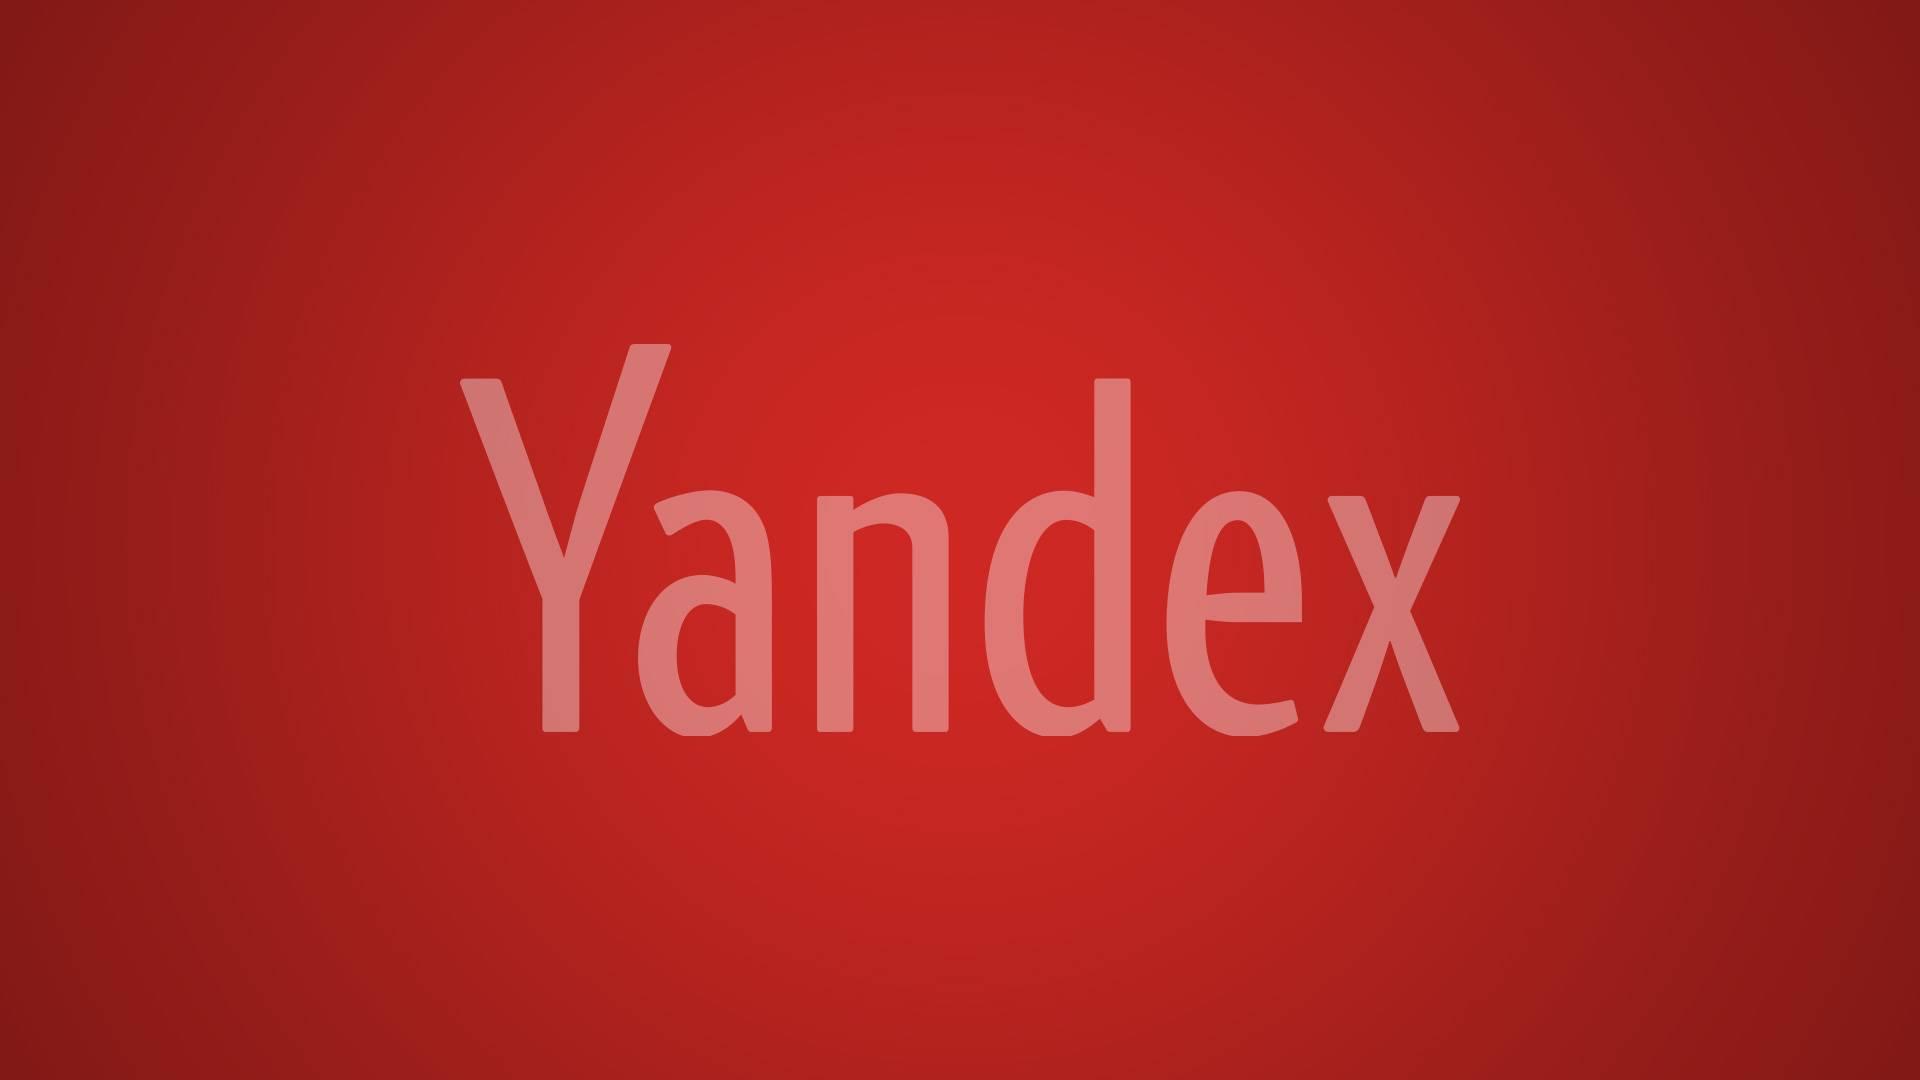 yandex hack nsa gchq